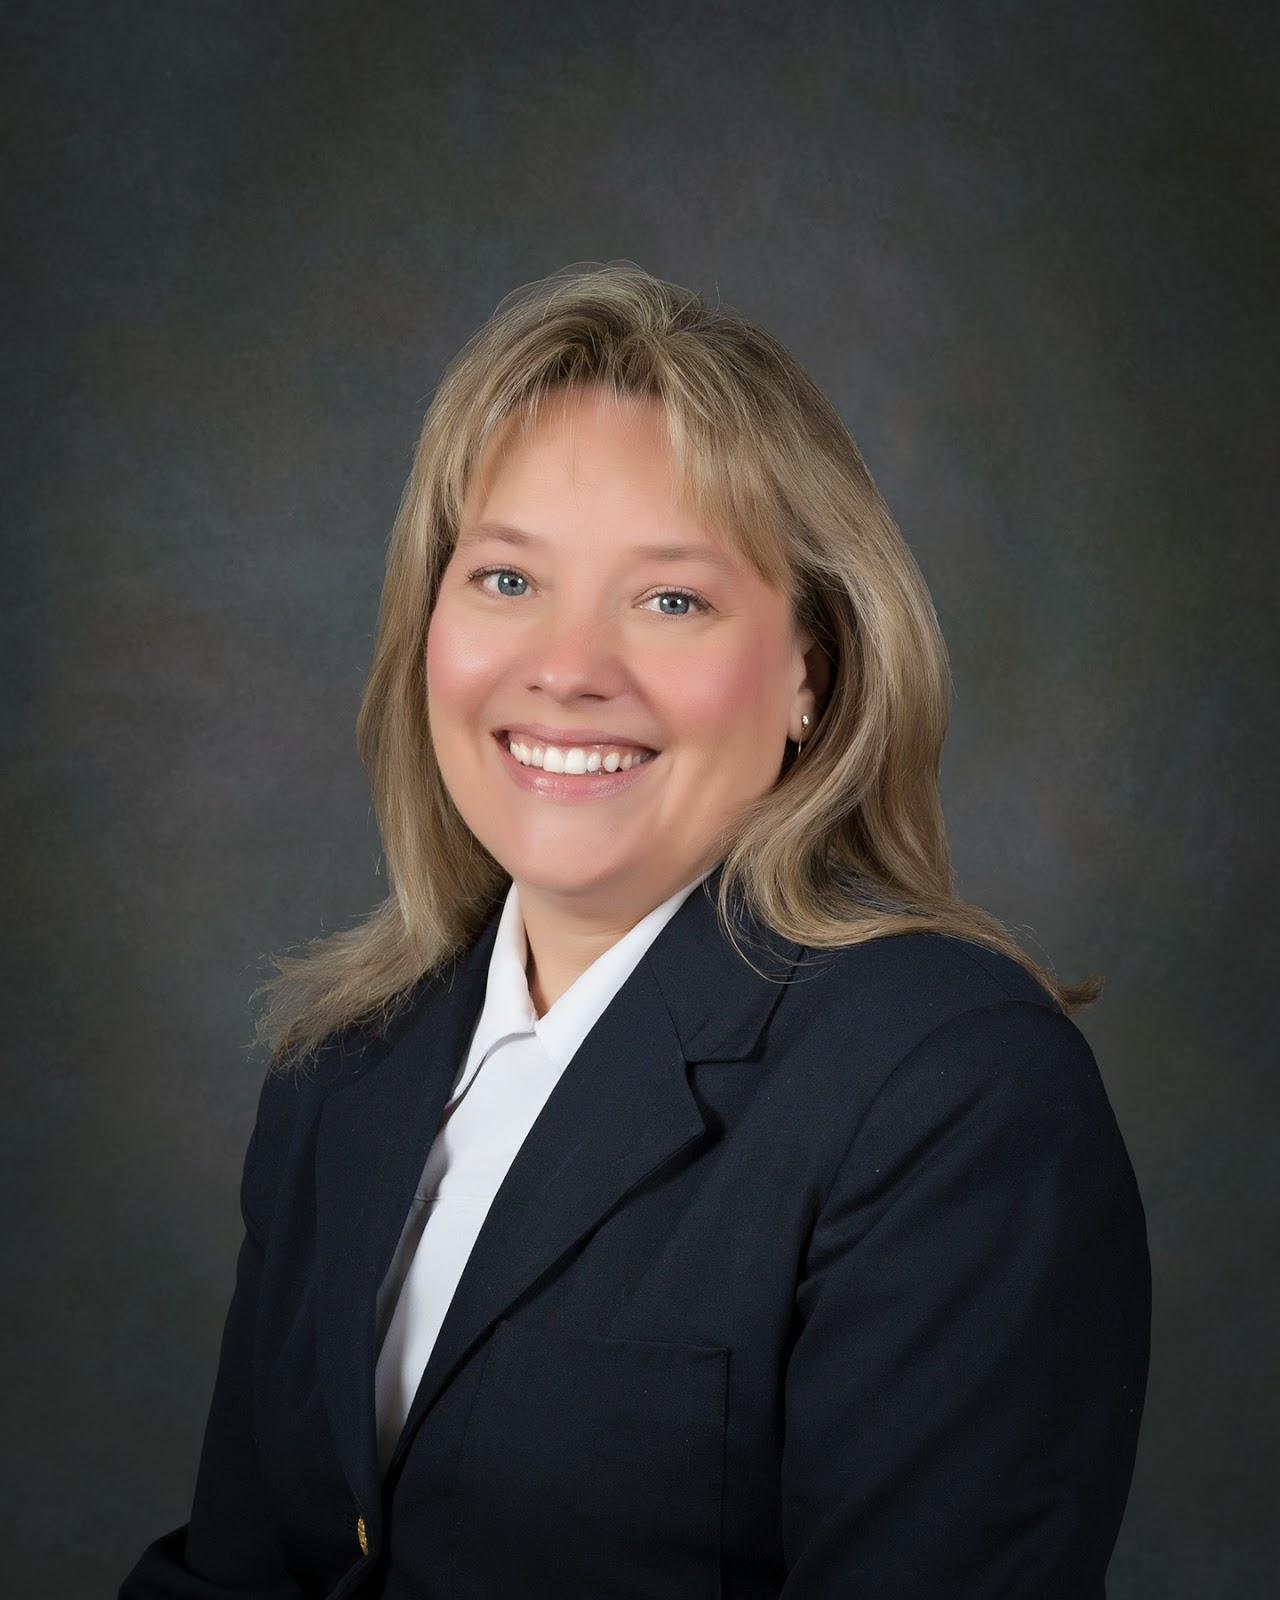 Kim Bartalos, Block Real Estate Services, LLC (BRES)